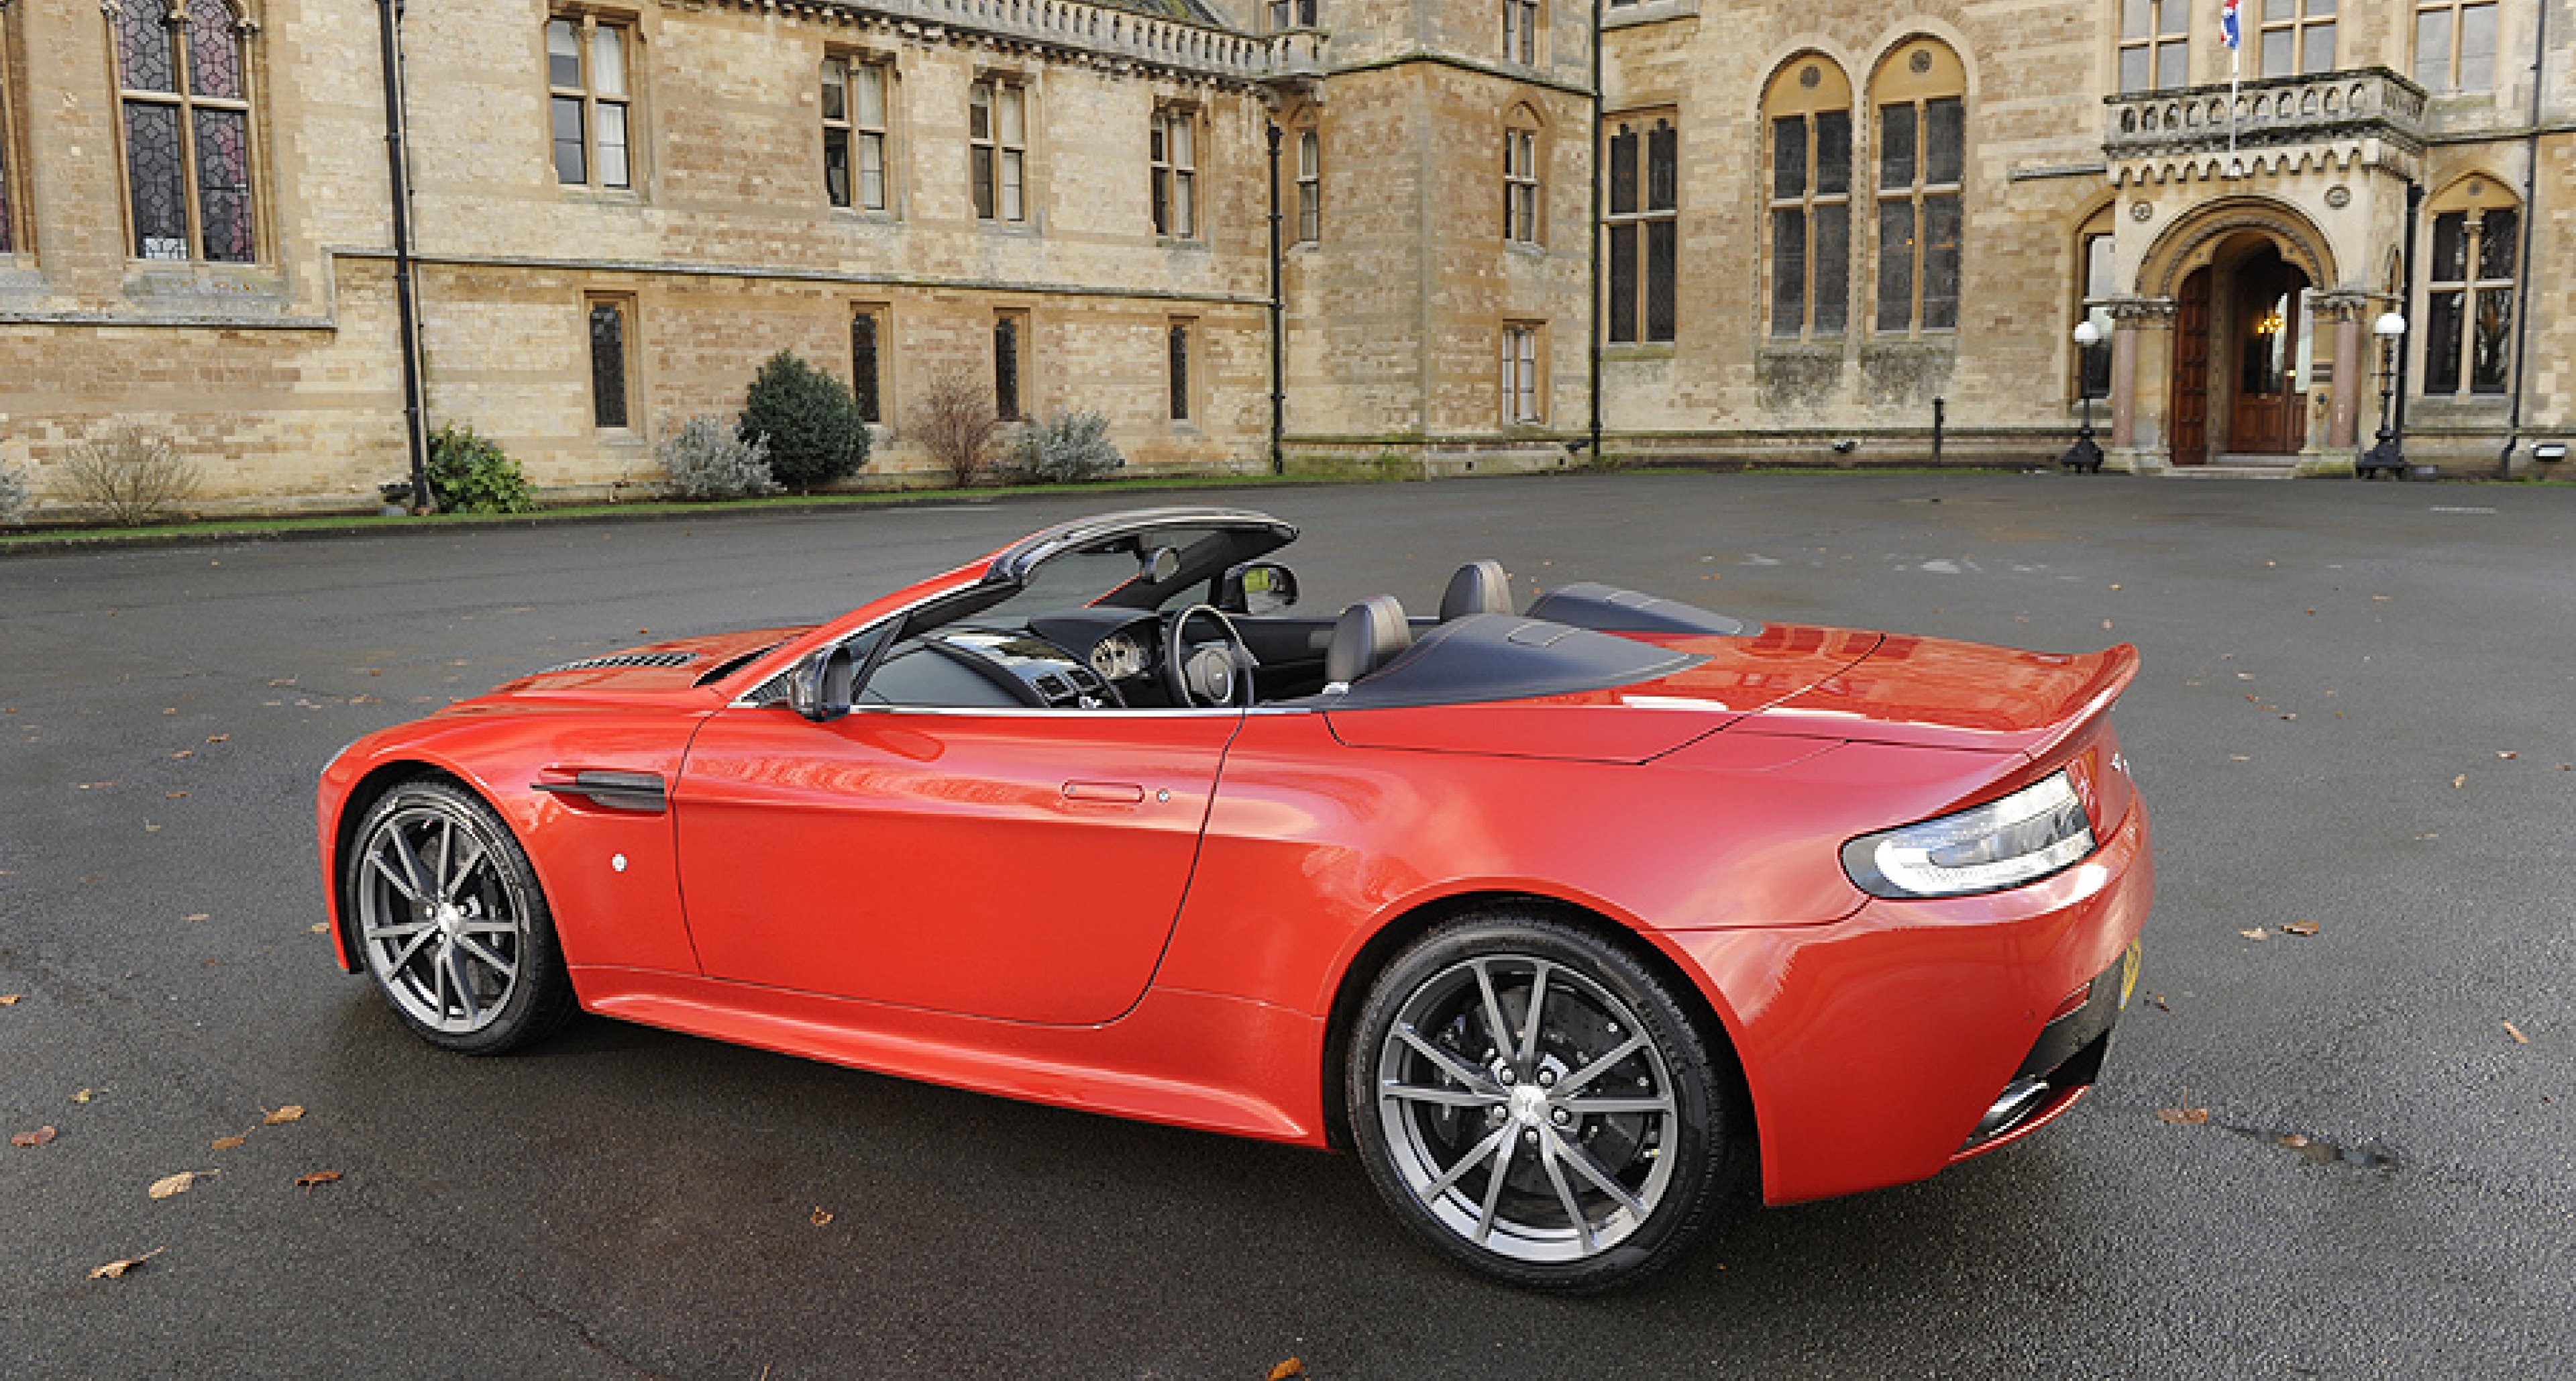 Driven Aston Martin V12 Vantage Roadster Classic Driver Magazine